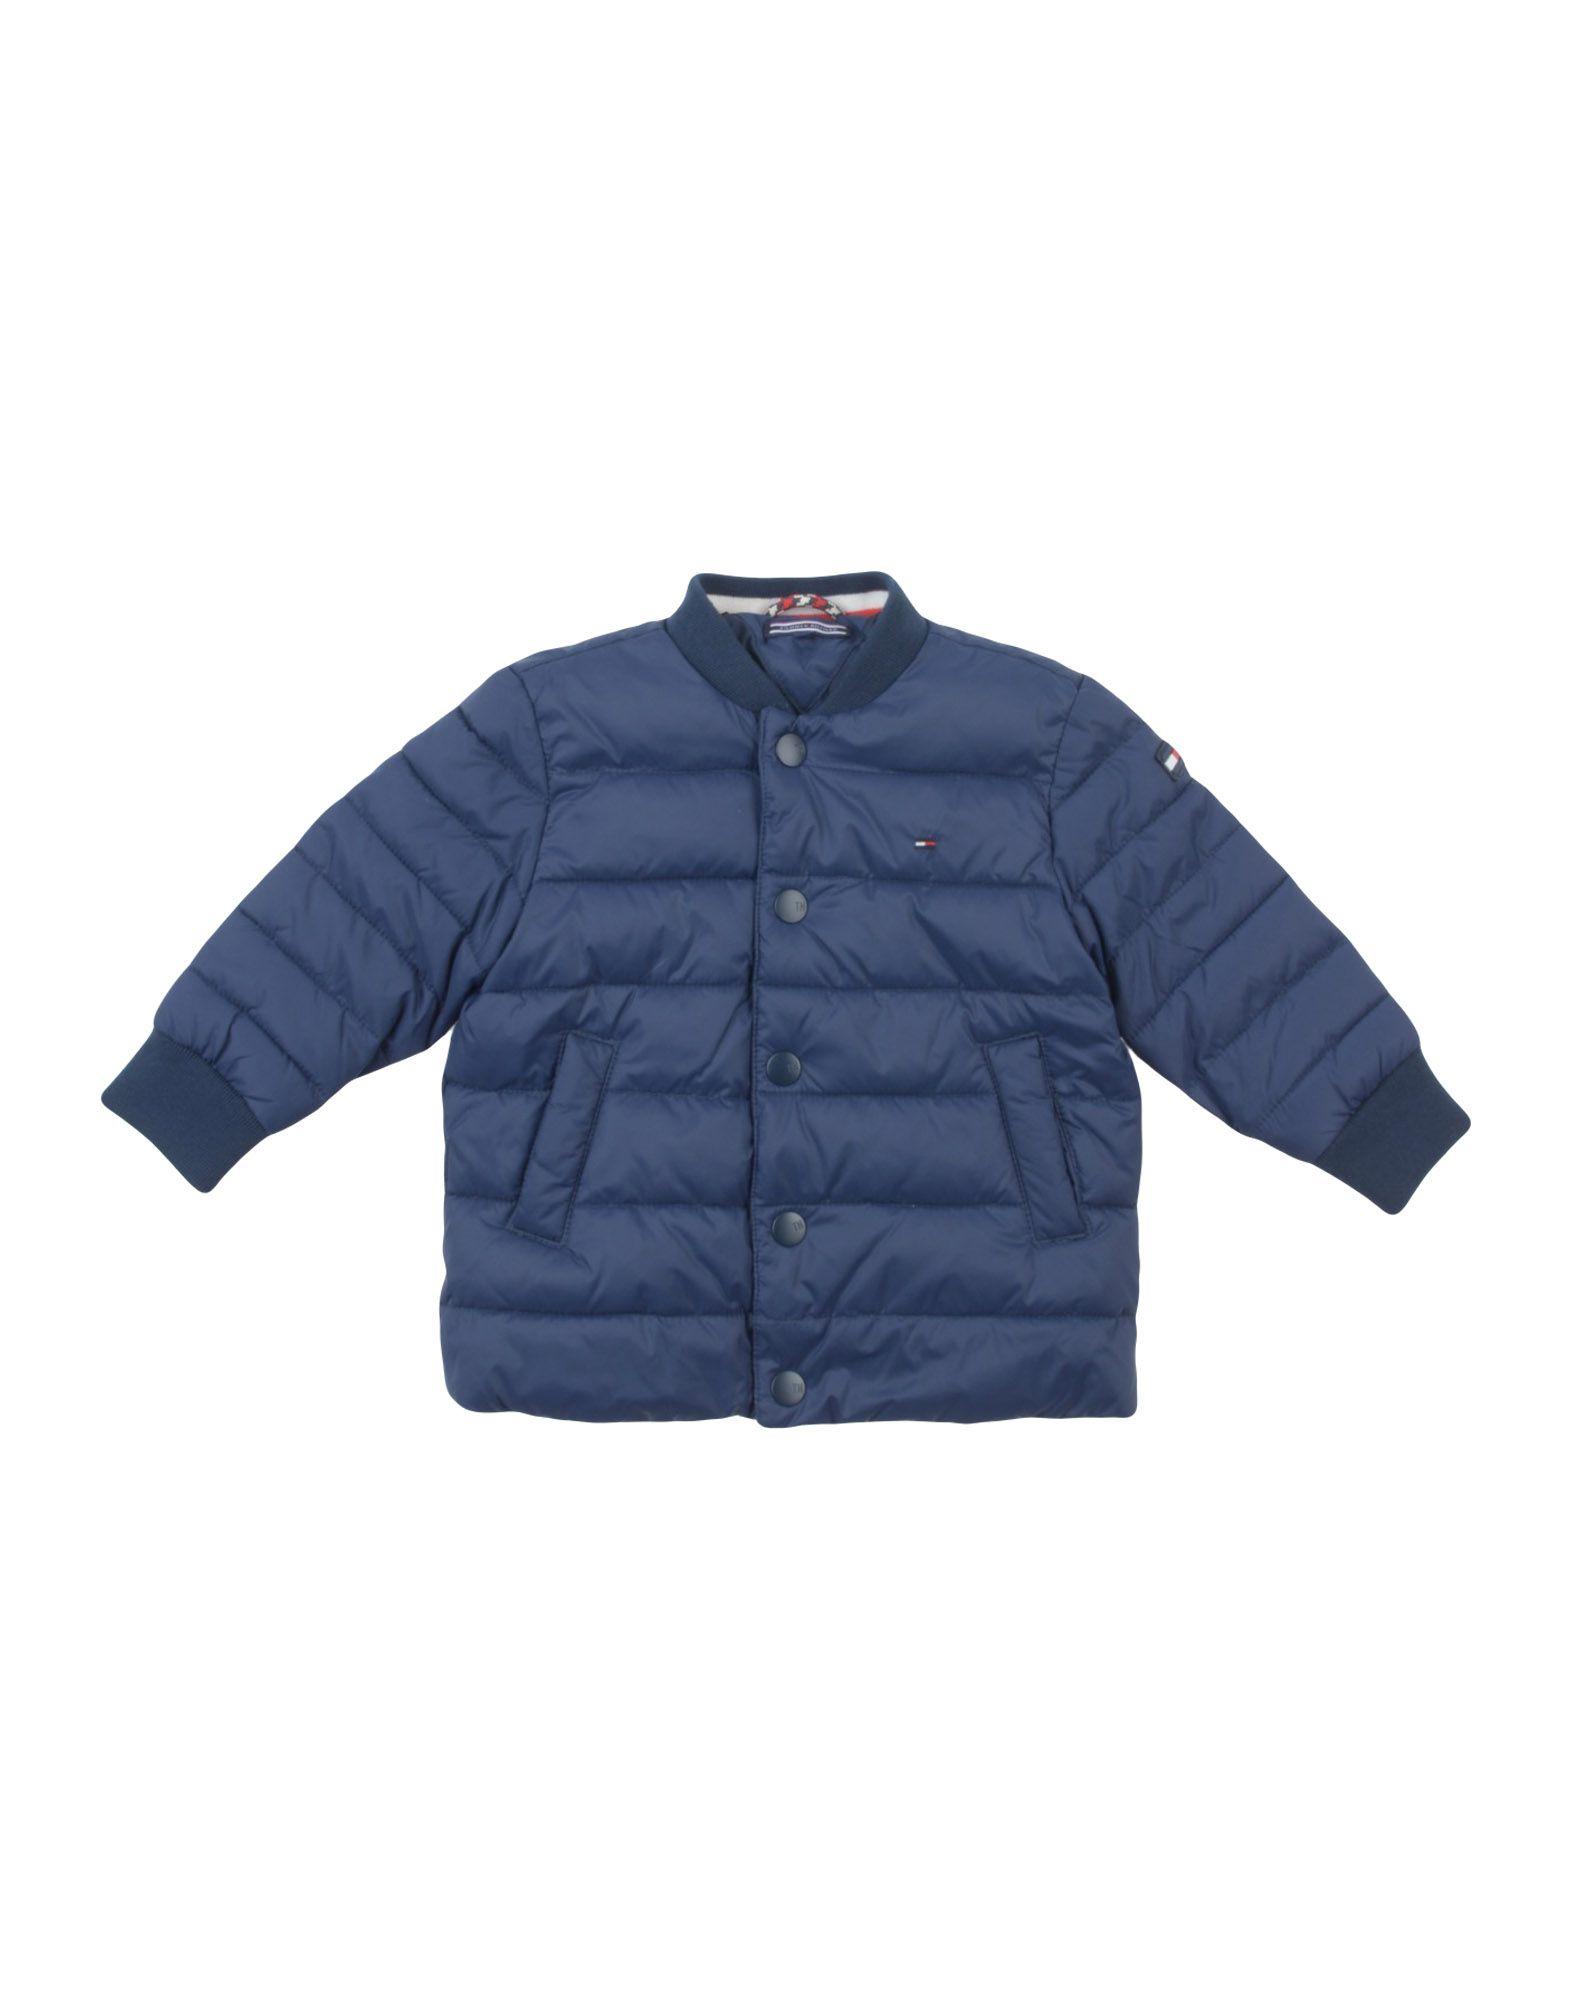 97c0bbfe87c Παλτα Και Μπουφαν Αγόρι Tommy Hilfiger 0-24 μηνών - Παιδικά ρούχα στο YOOX